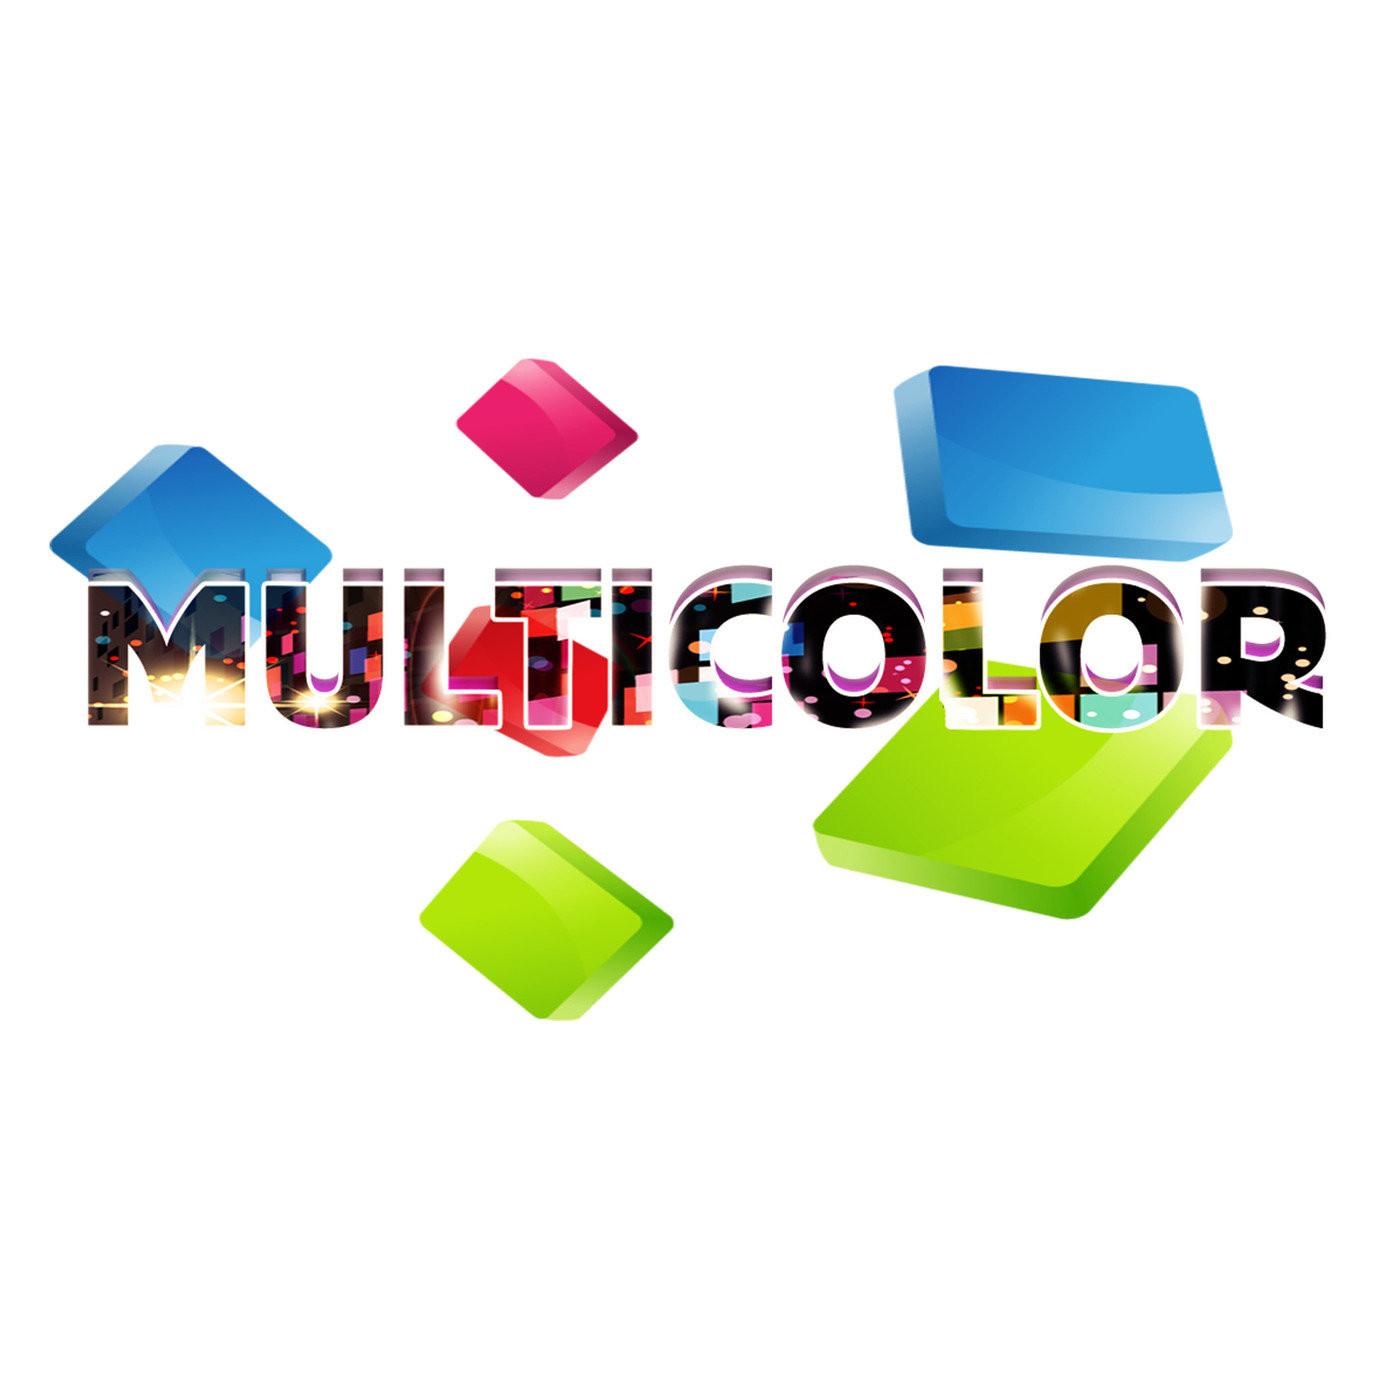 <![CDATA[MulticolorMX]]>